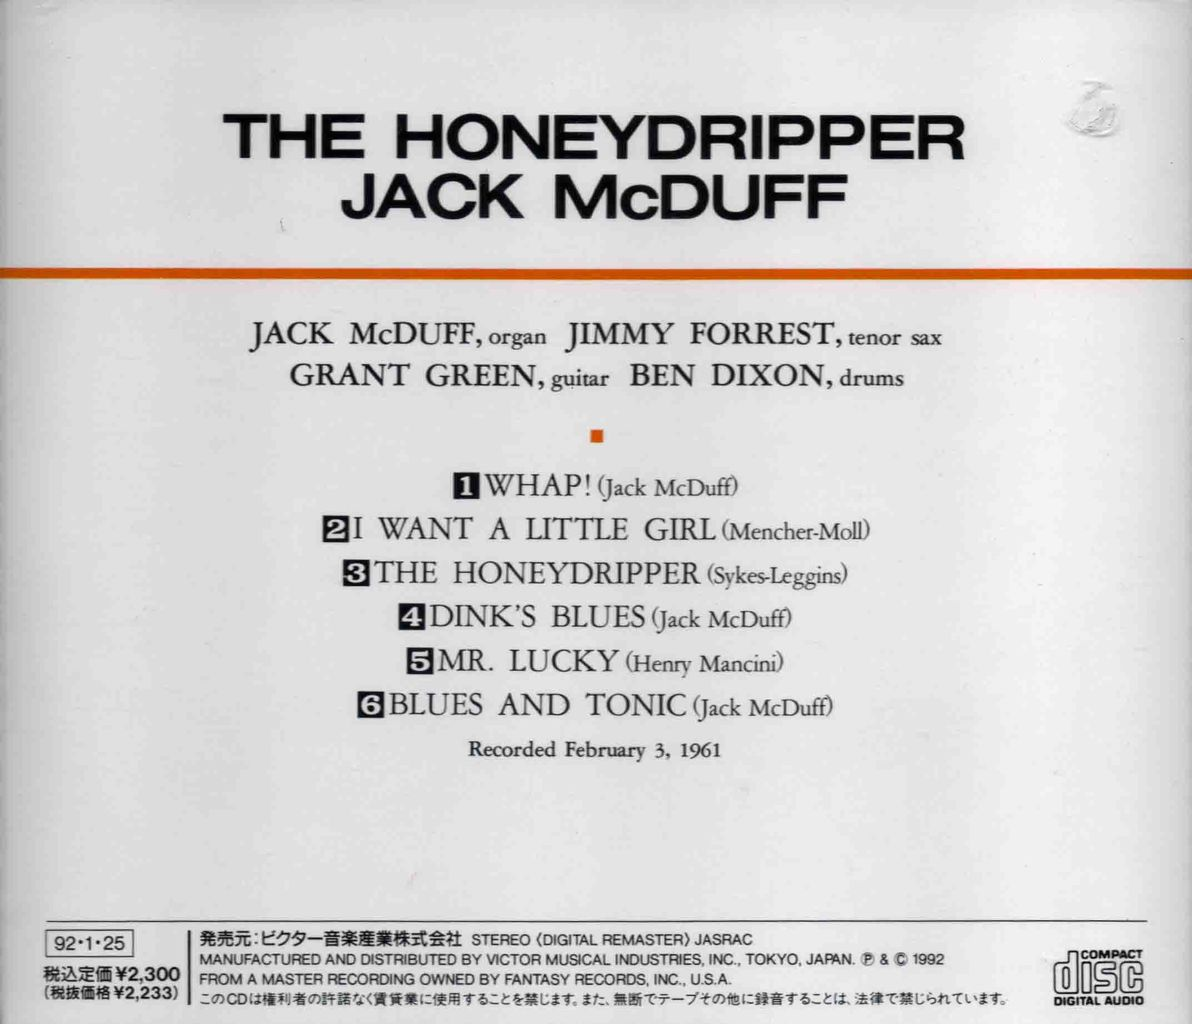 THE HONEY DRIPPER-2